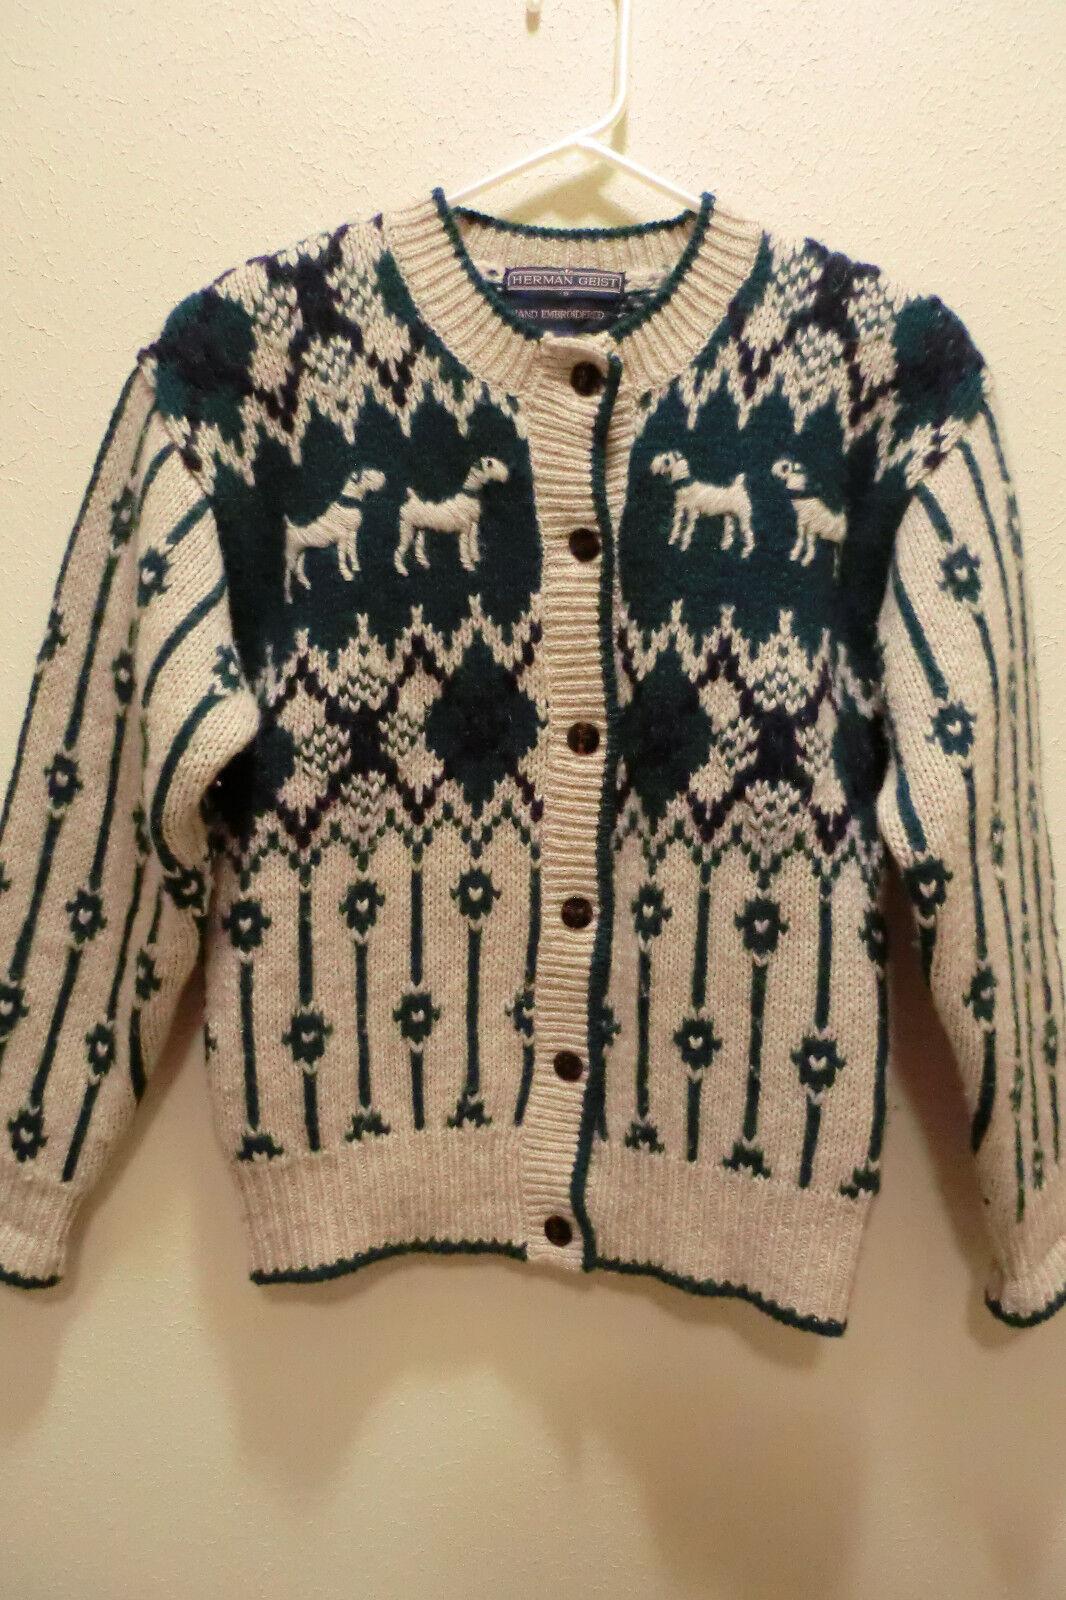 Vtg. Herman Geist Wool Sweater with Dogs Green Tan bluee Size S Women's